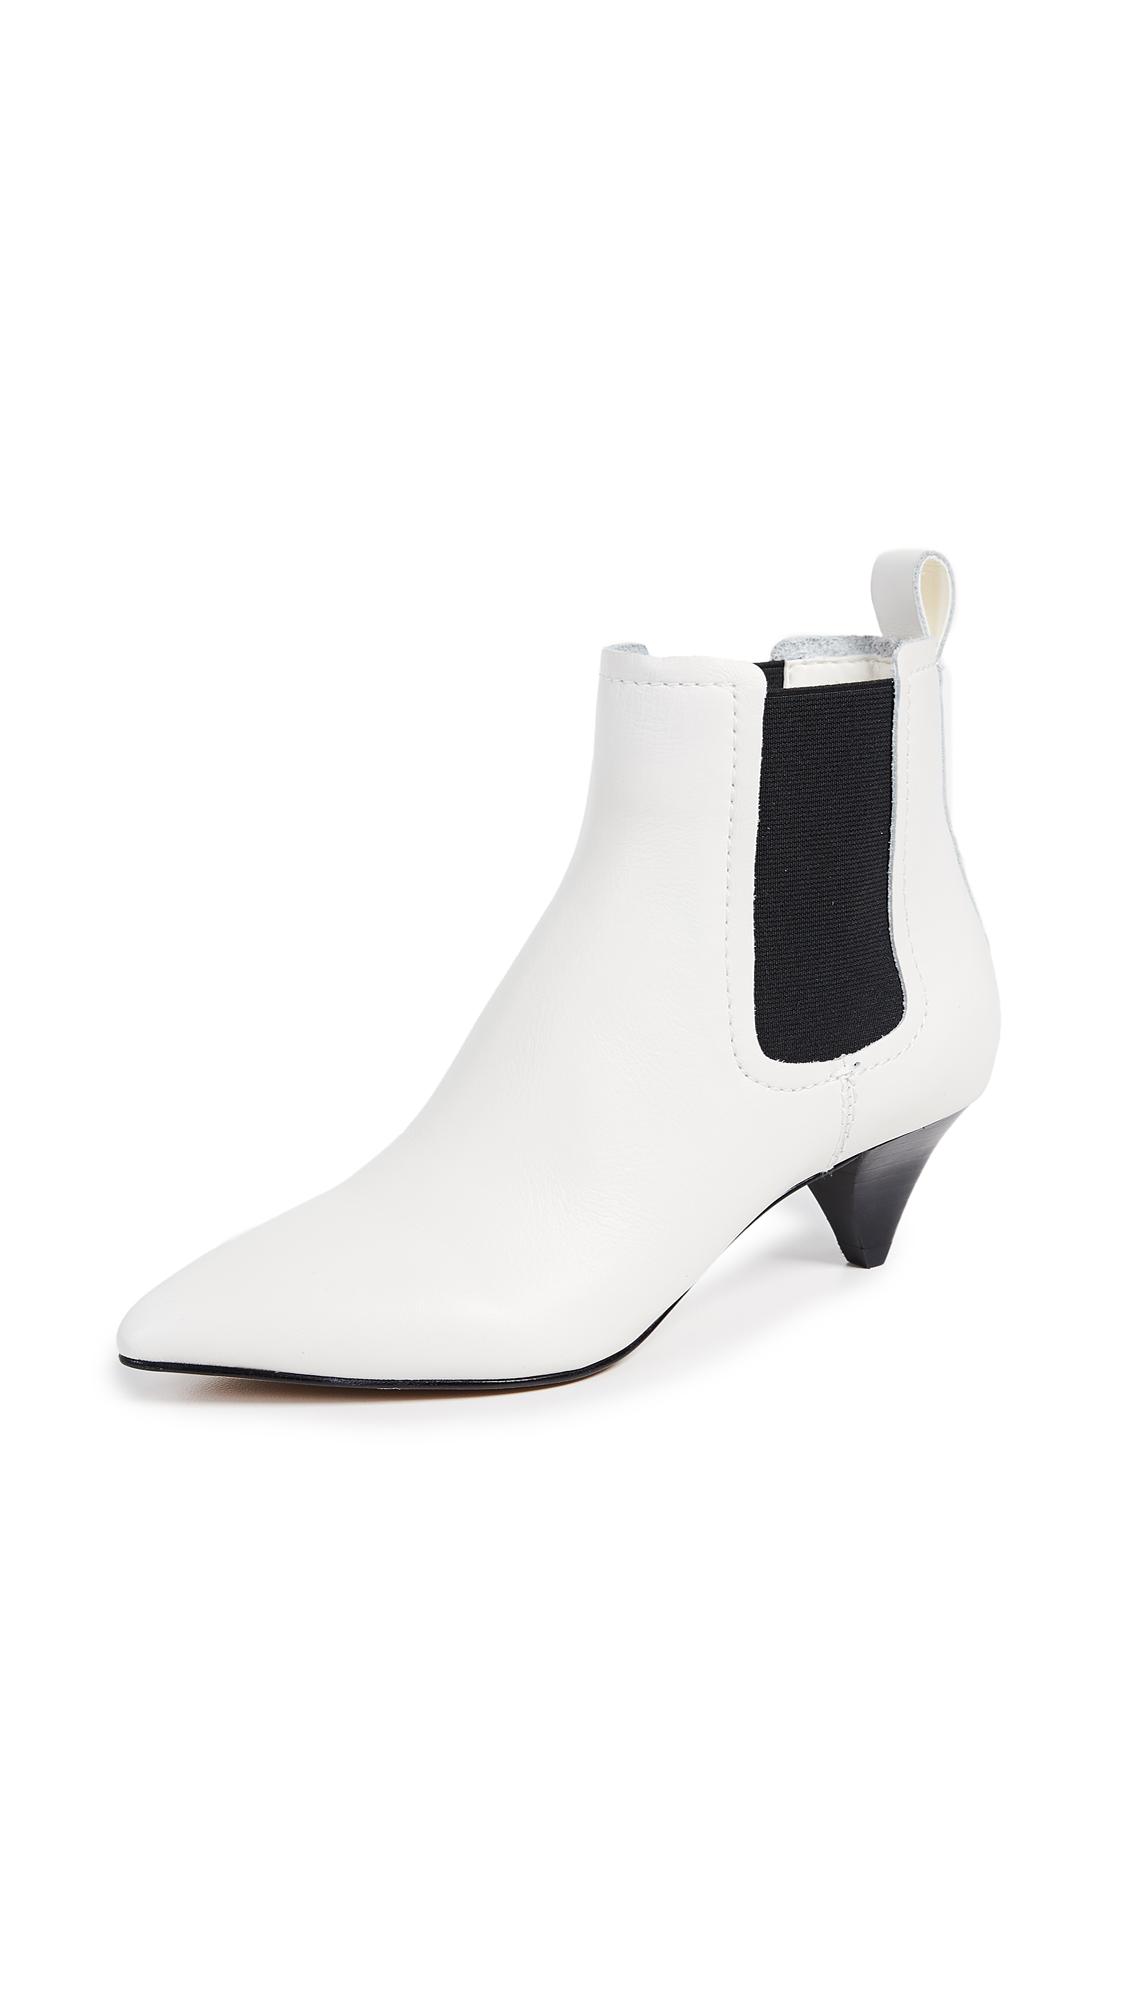 Dolce Vita Yorona Booties - Off White